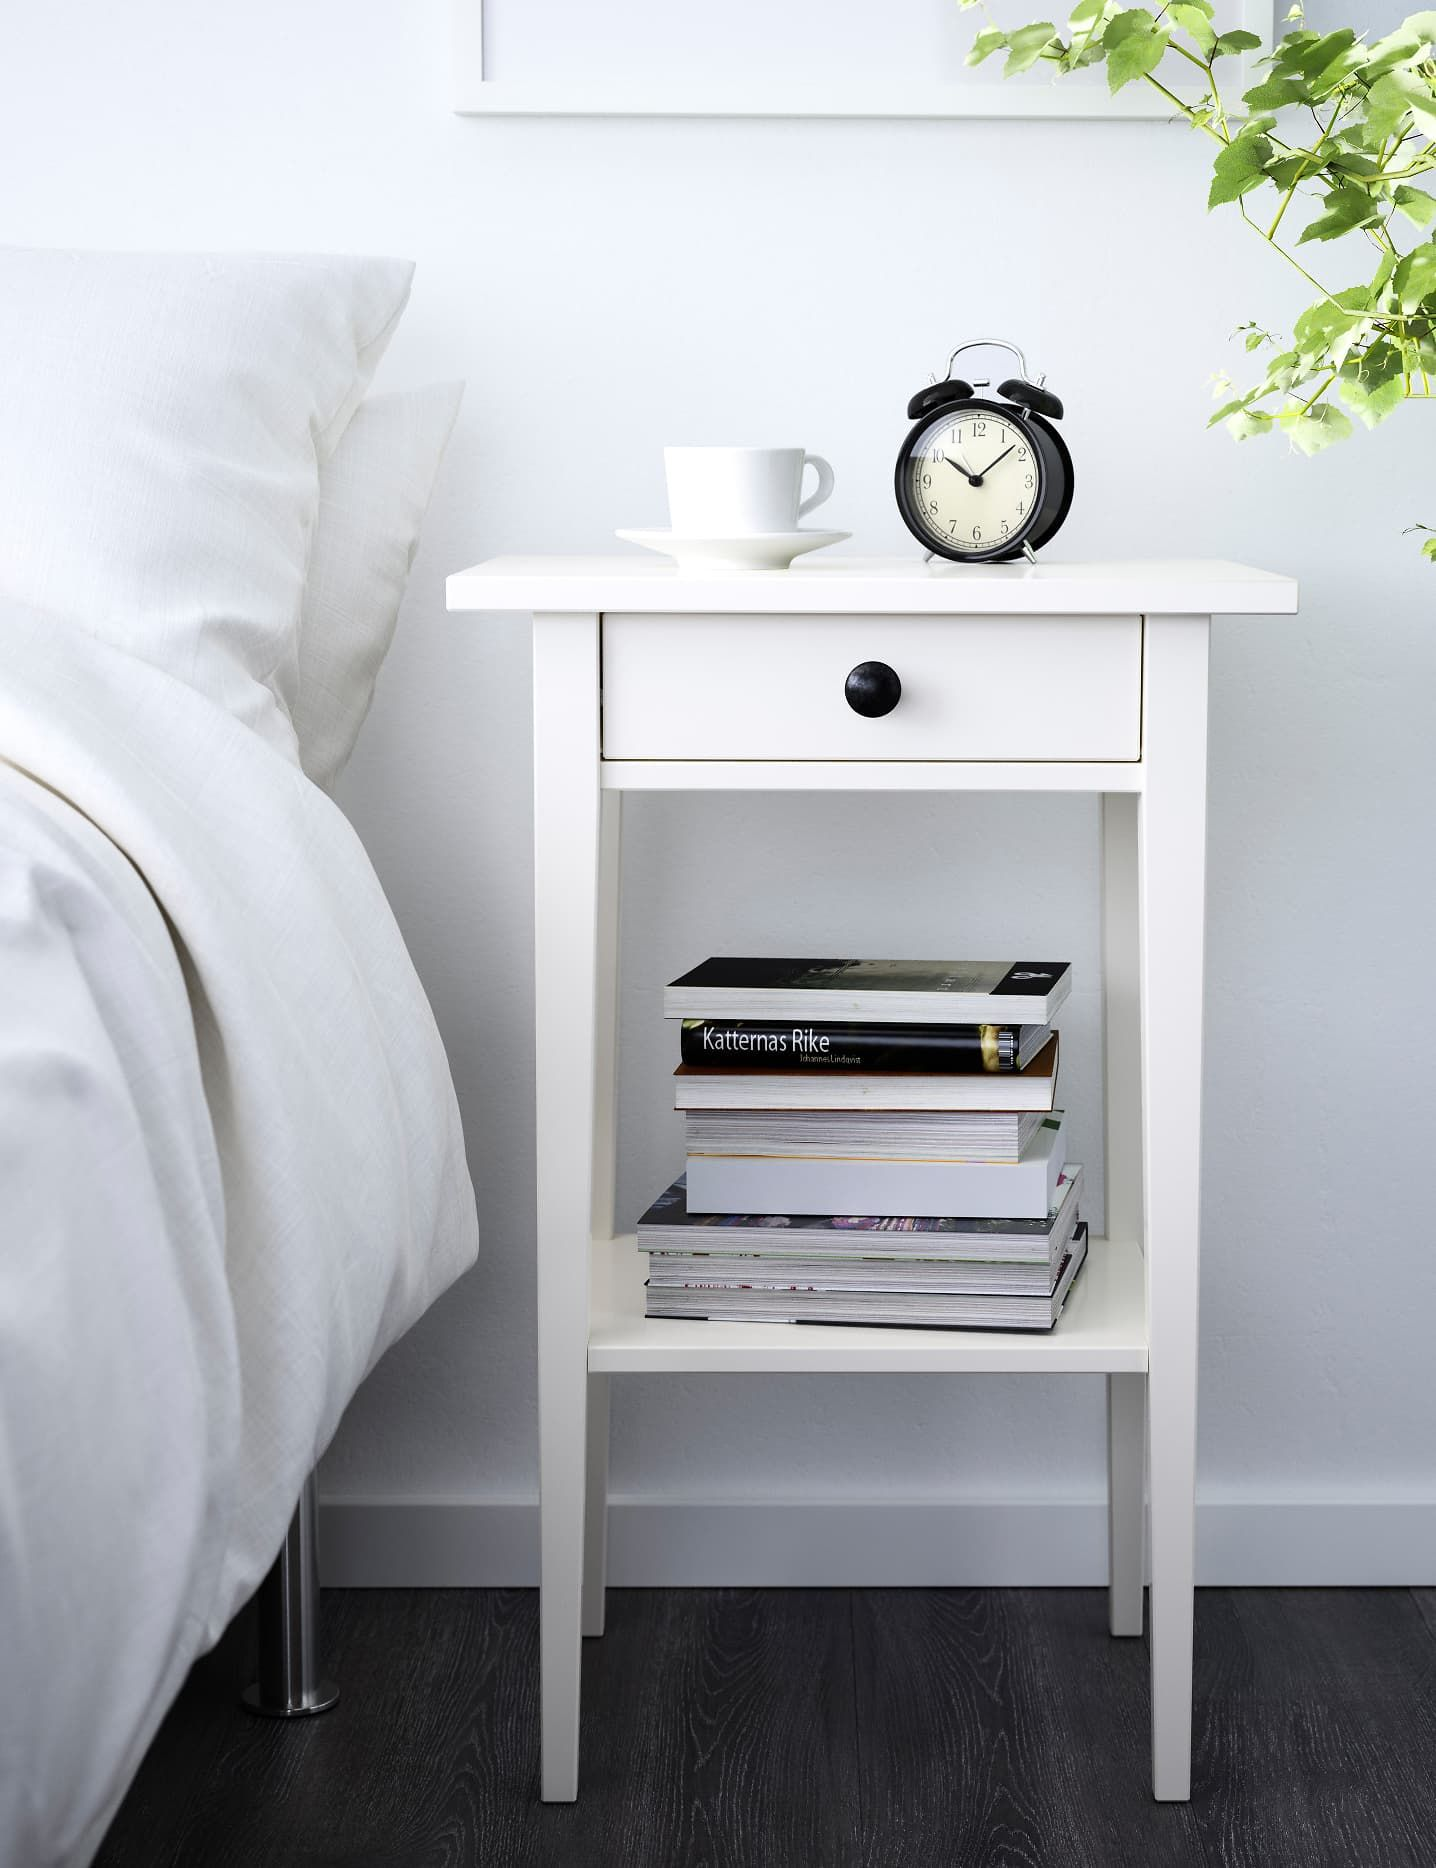 Locker Bedside Table: Top 10 Best Nightstands And Bedside Tables Under $200